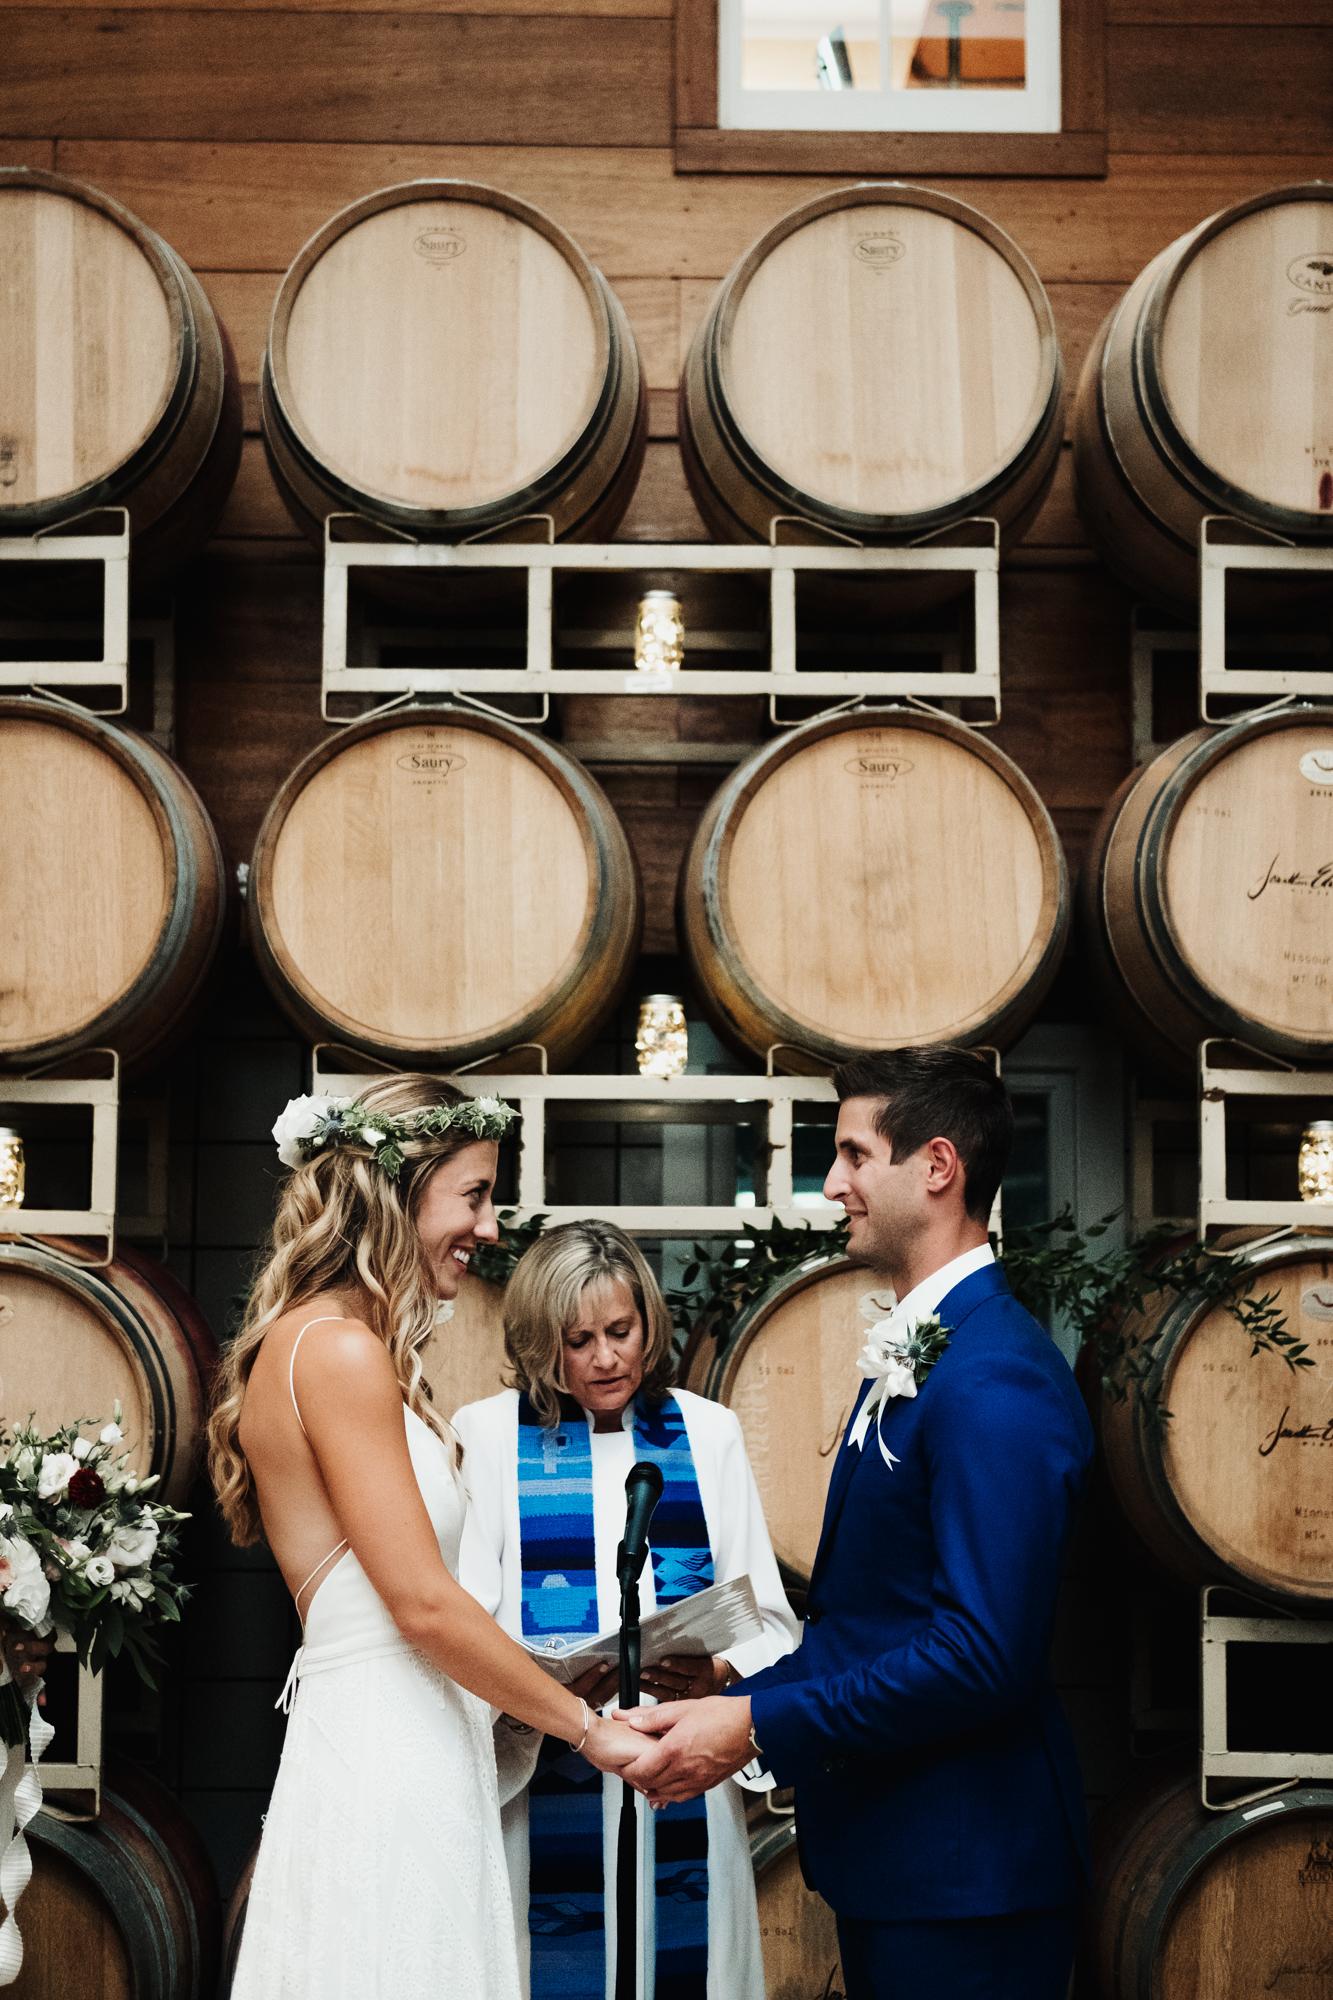 Wedding_Francis_Boucher_Jonathan_Edwards_Winery_2018-44.jpg